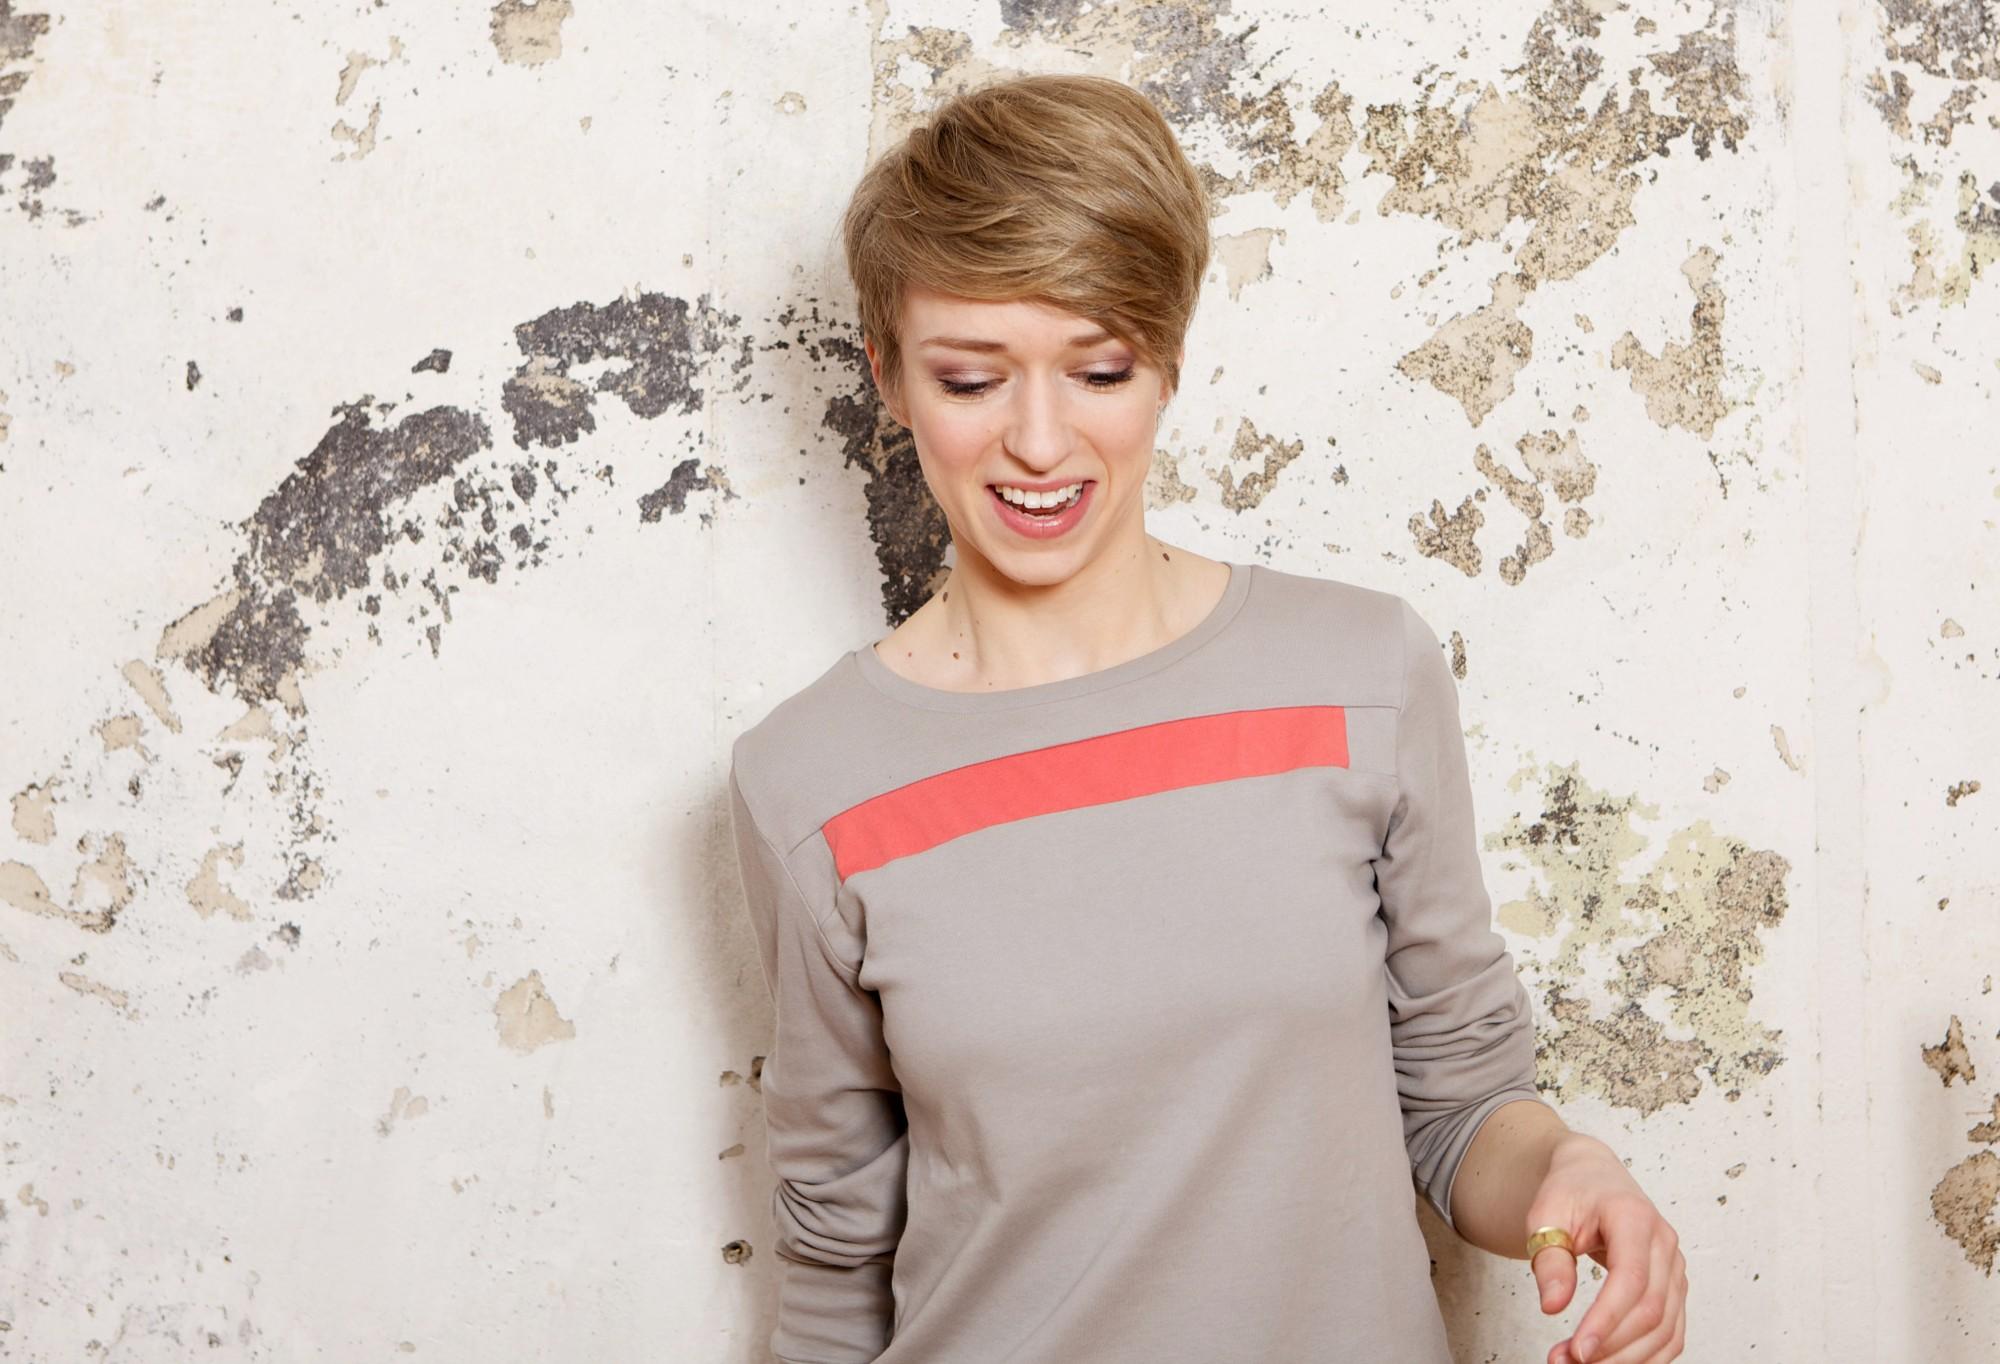 LOVECO-Gründerin Christina Wille